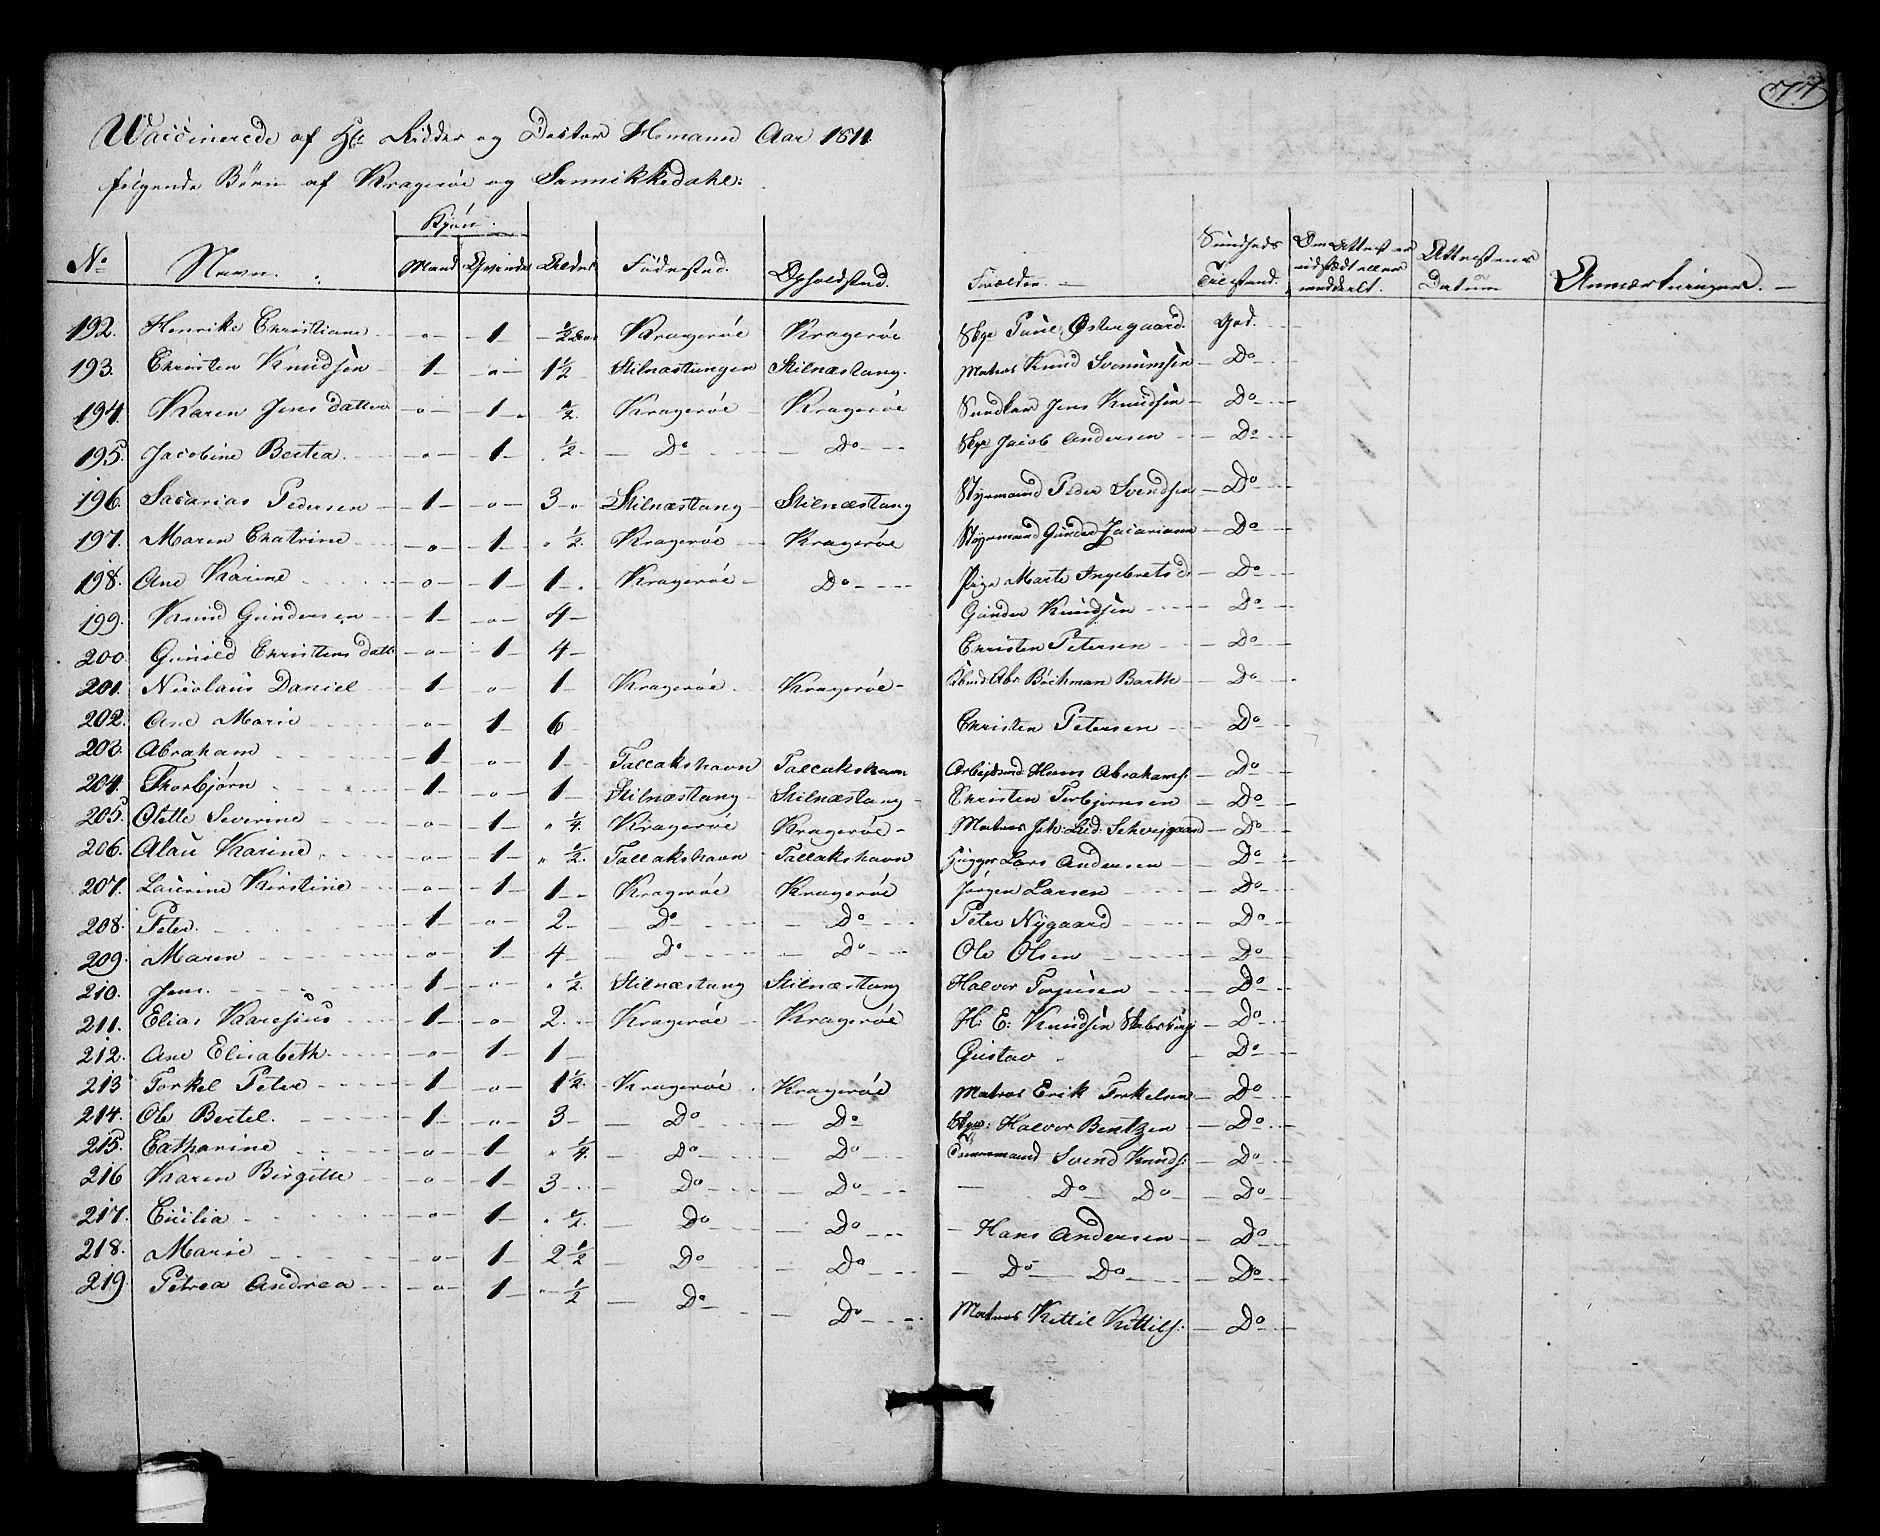 SAKO, Kragerø kirkebøker, F/Fa/L0003: Ministerialbok nr. 3, 1802-1813, s. 77